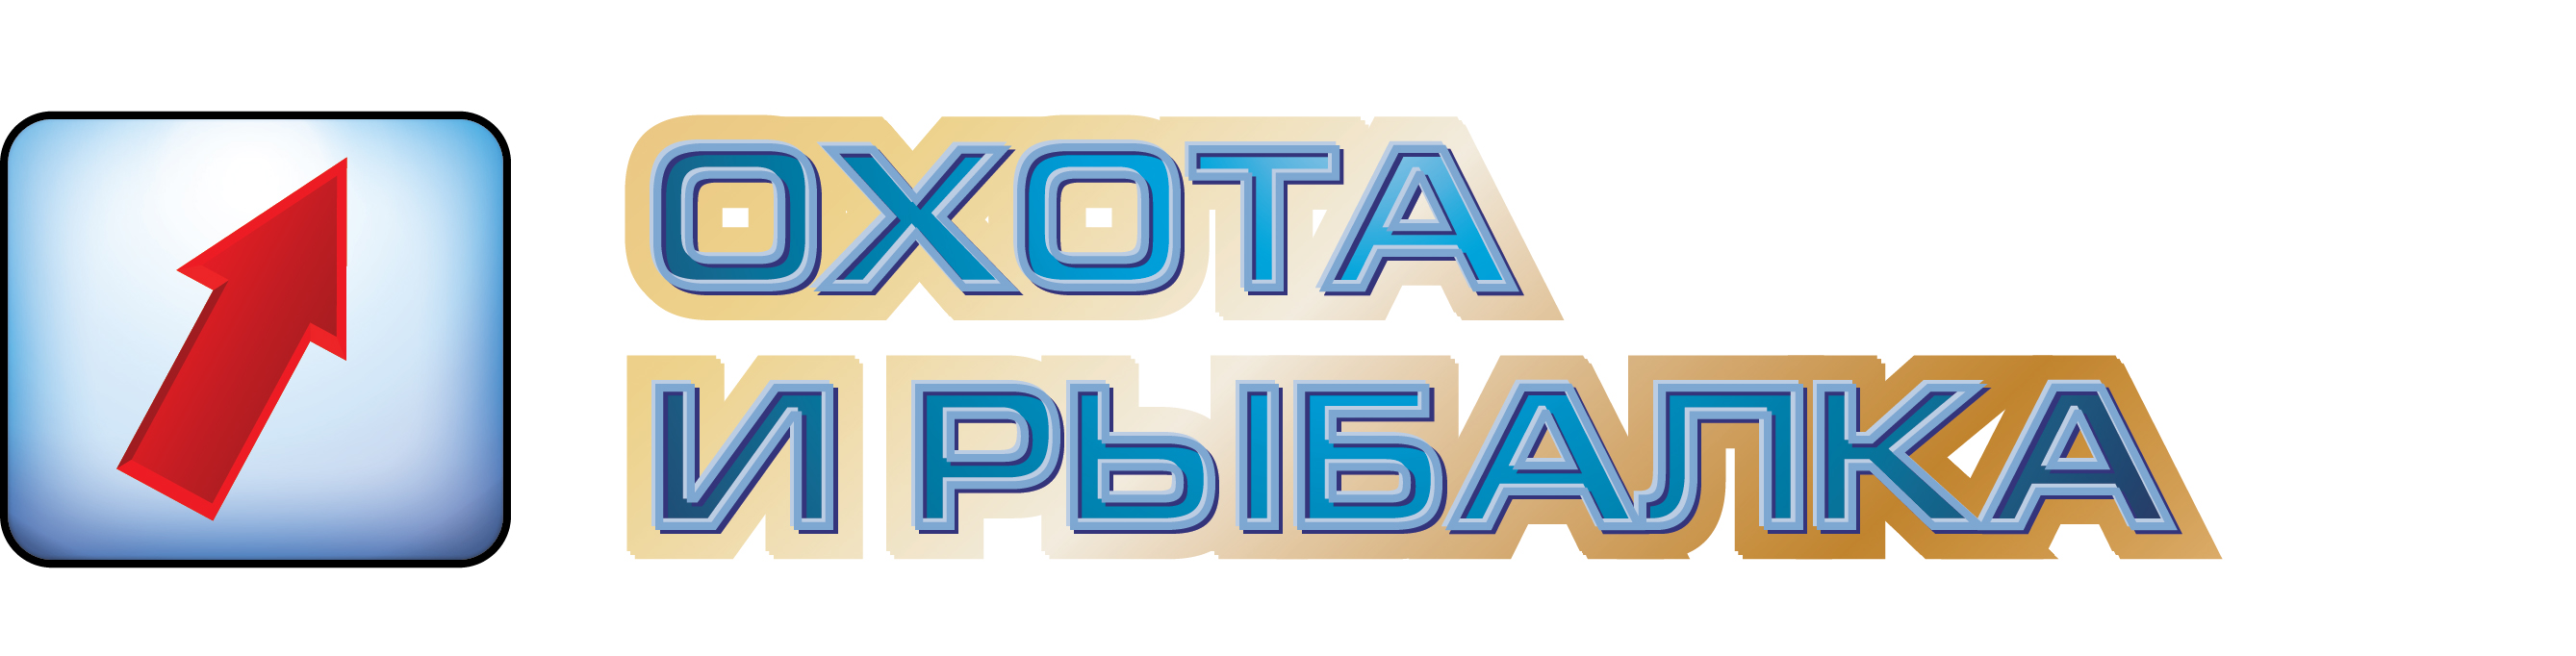 Создание концепции заставки и логотипа (телеканал) фото f_132566d4bce7634d.jpg